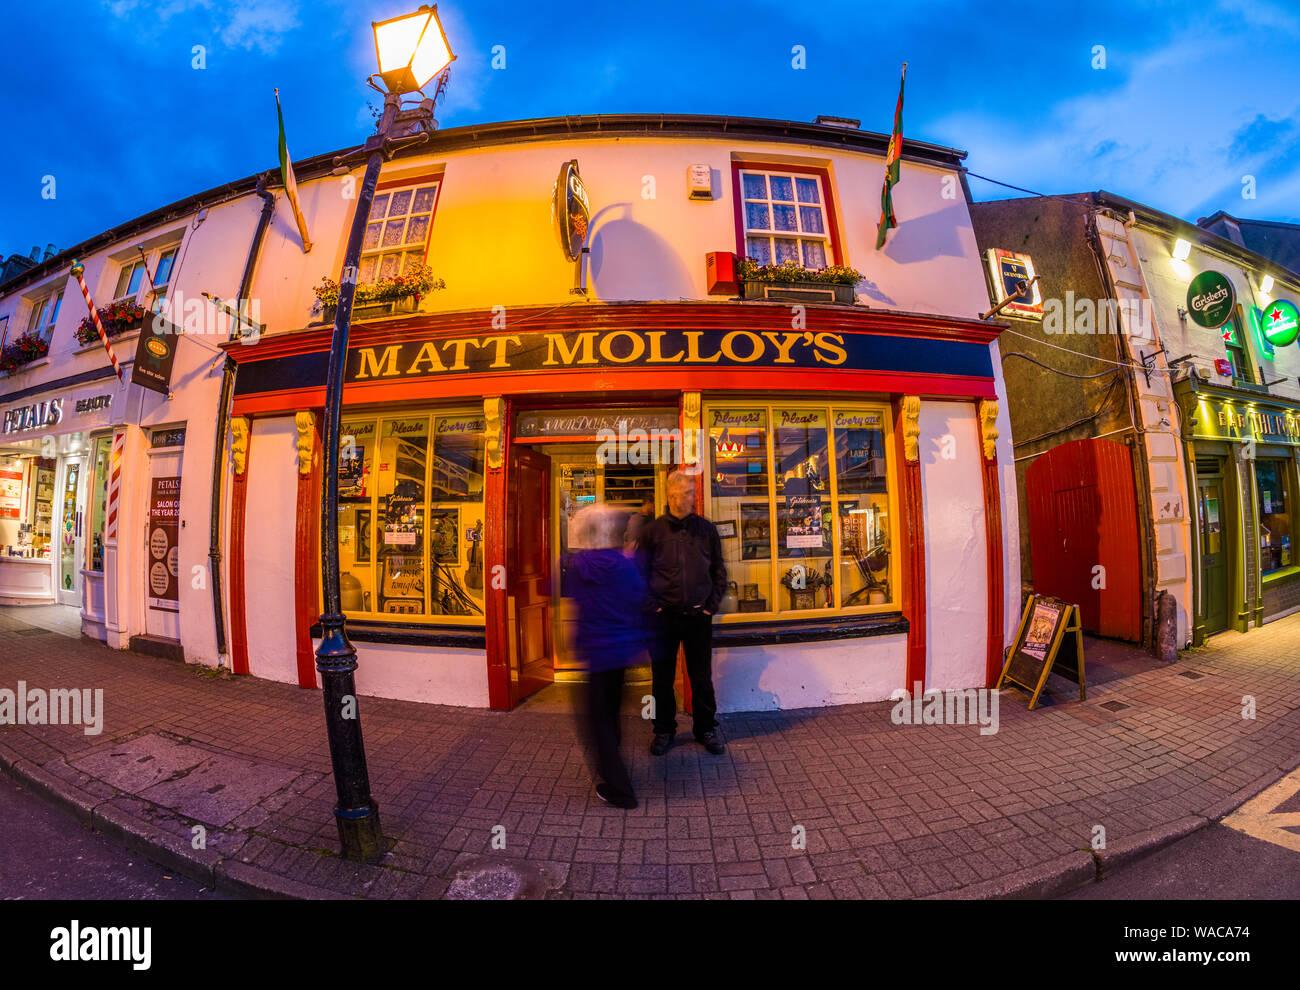 Whats On in Westport - Discover Ireland